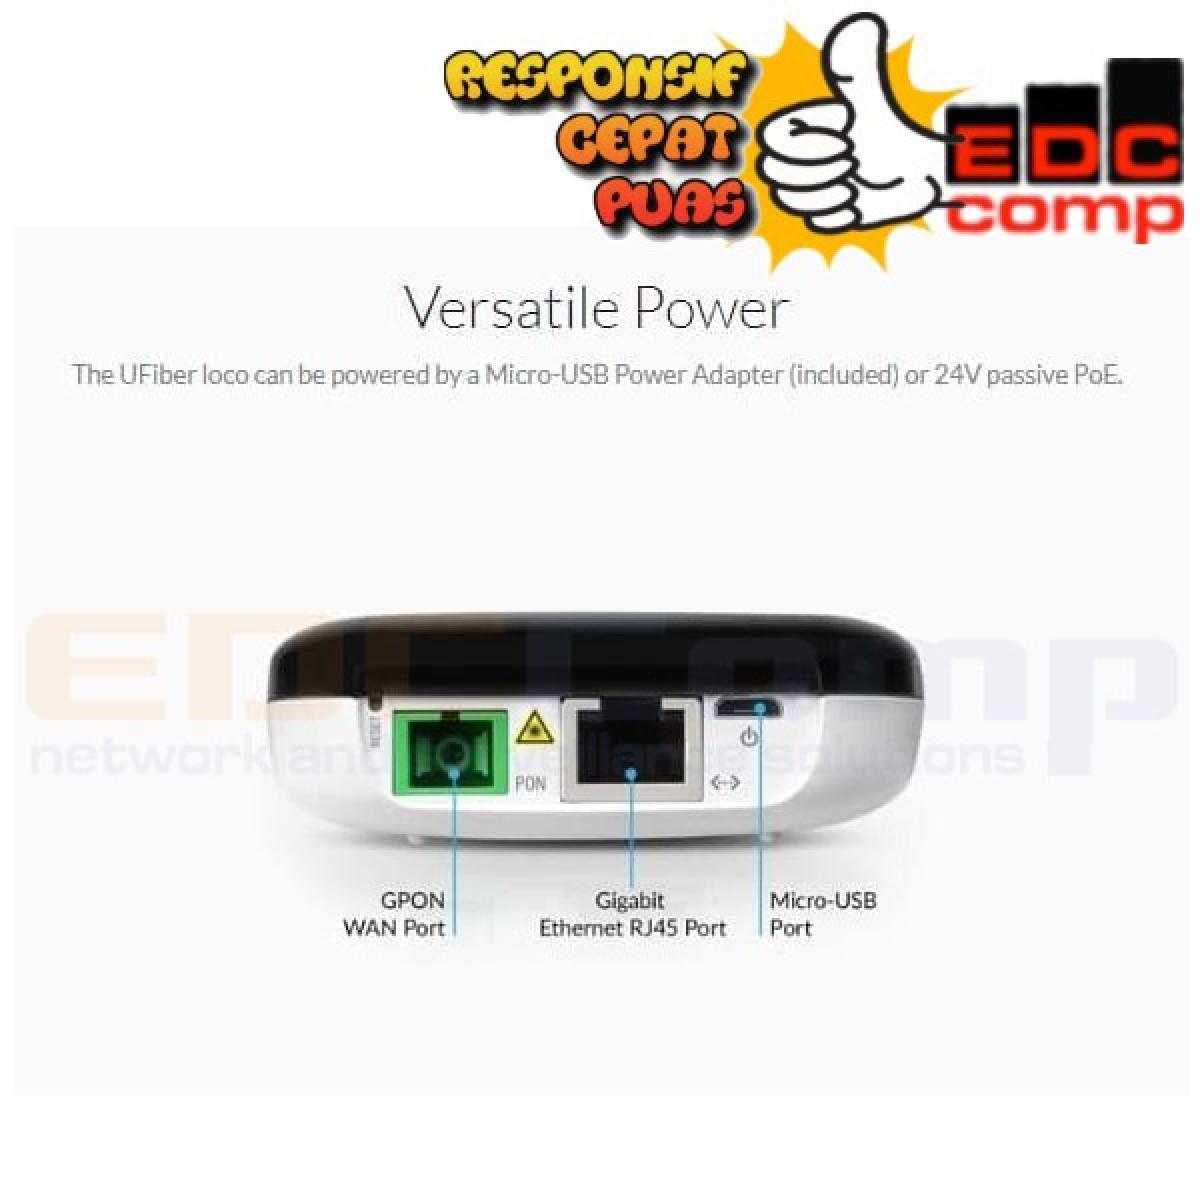 UF‑LOCO UFiber Loco Low-Cost GPON Optical Network Unit - EdcComp